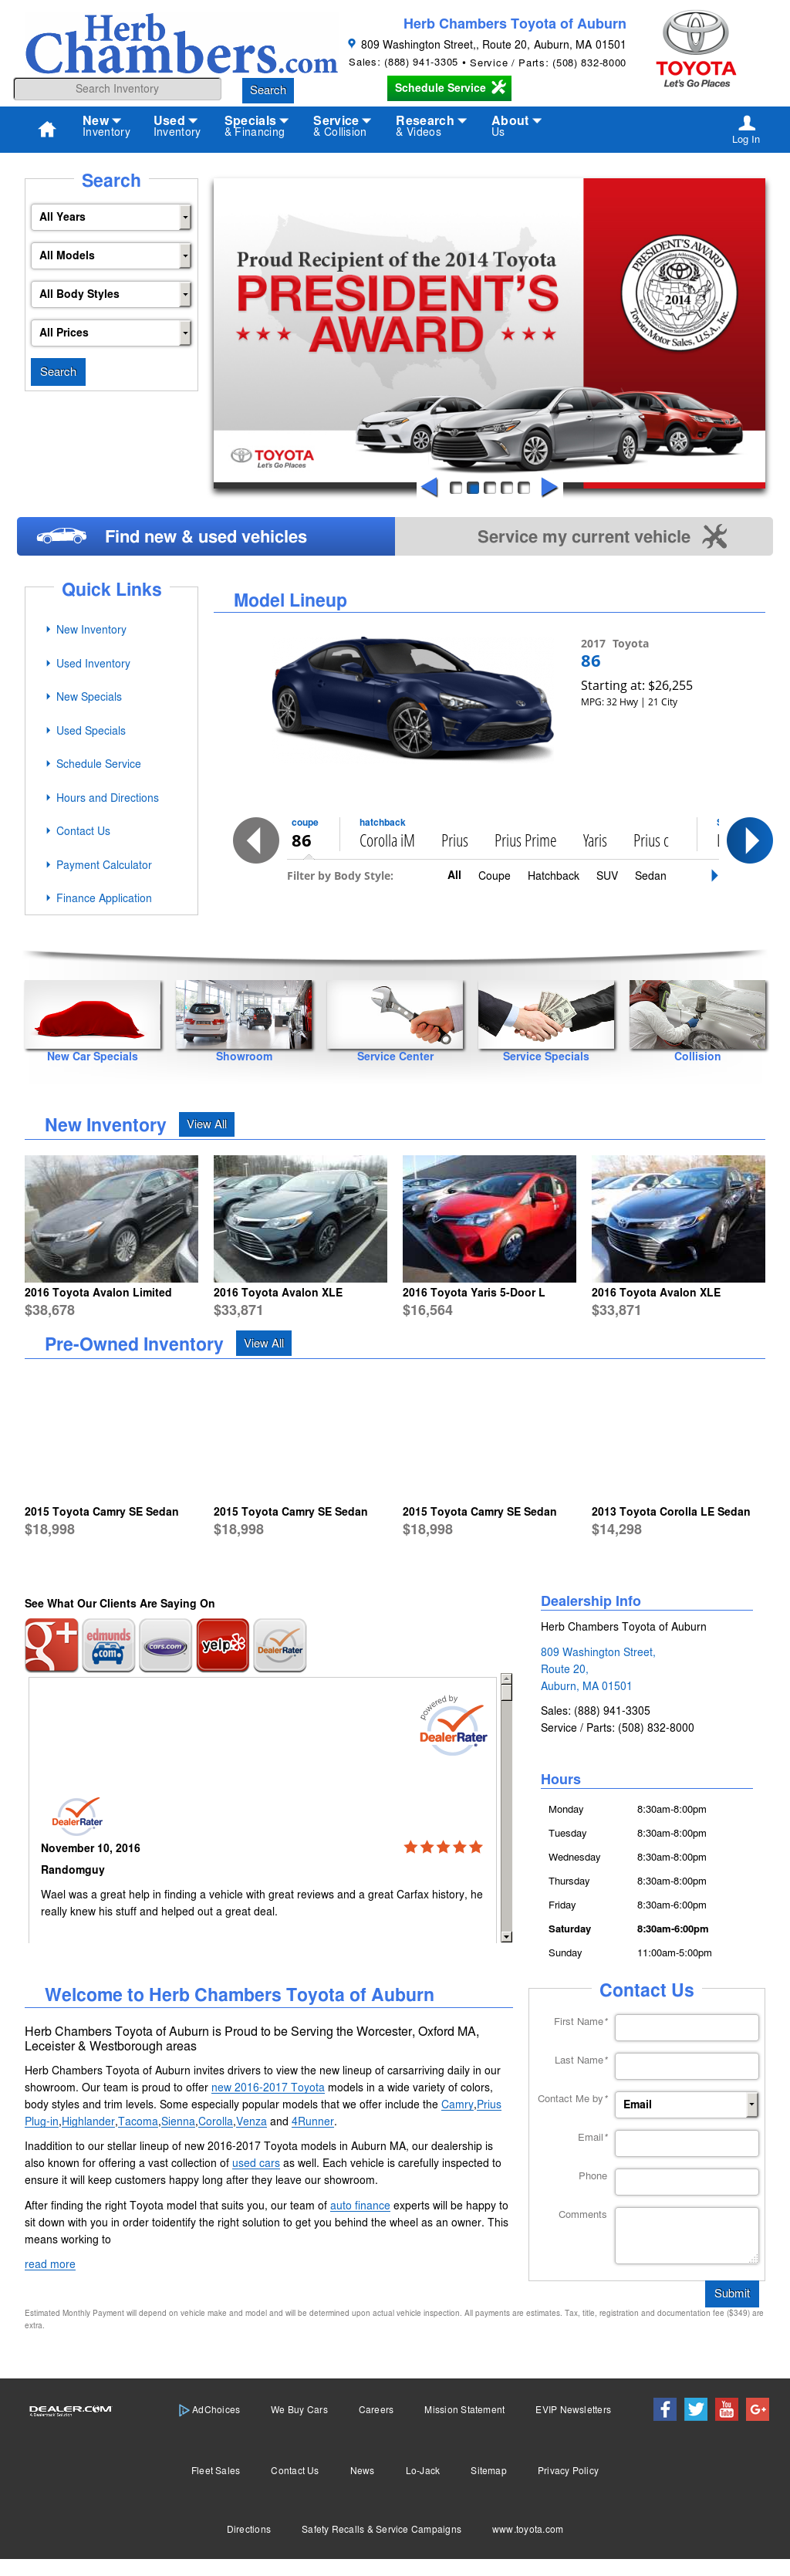 Herb Chambers Toyota Scion Auburn petitors Revenue and